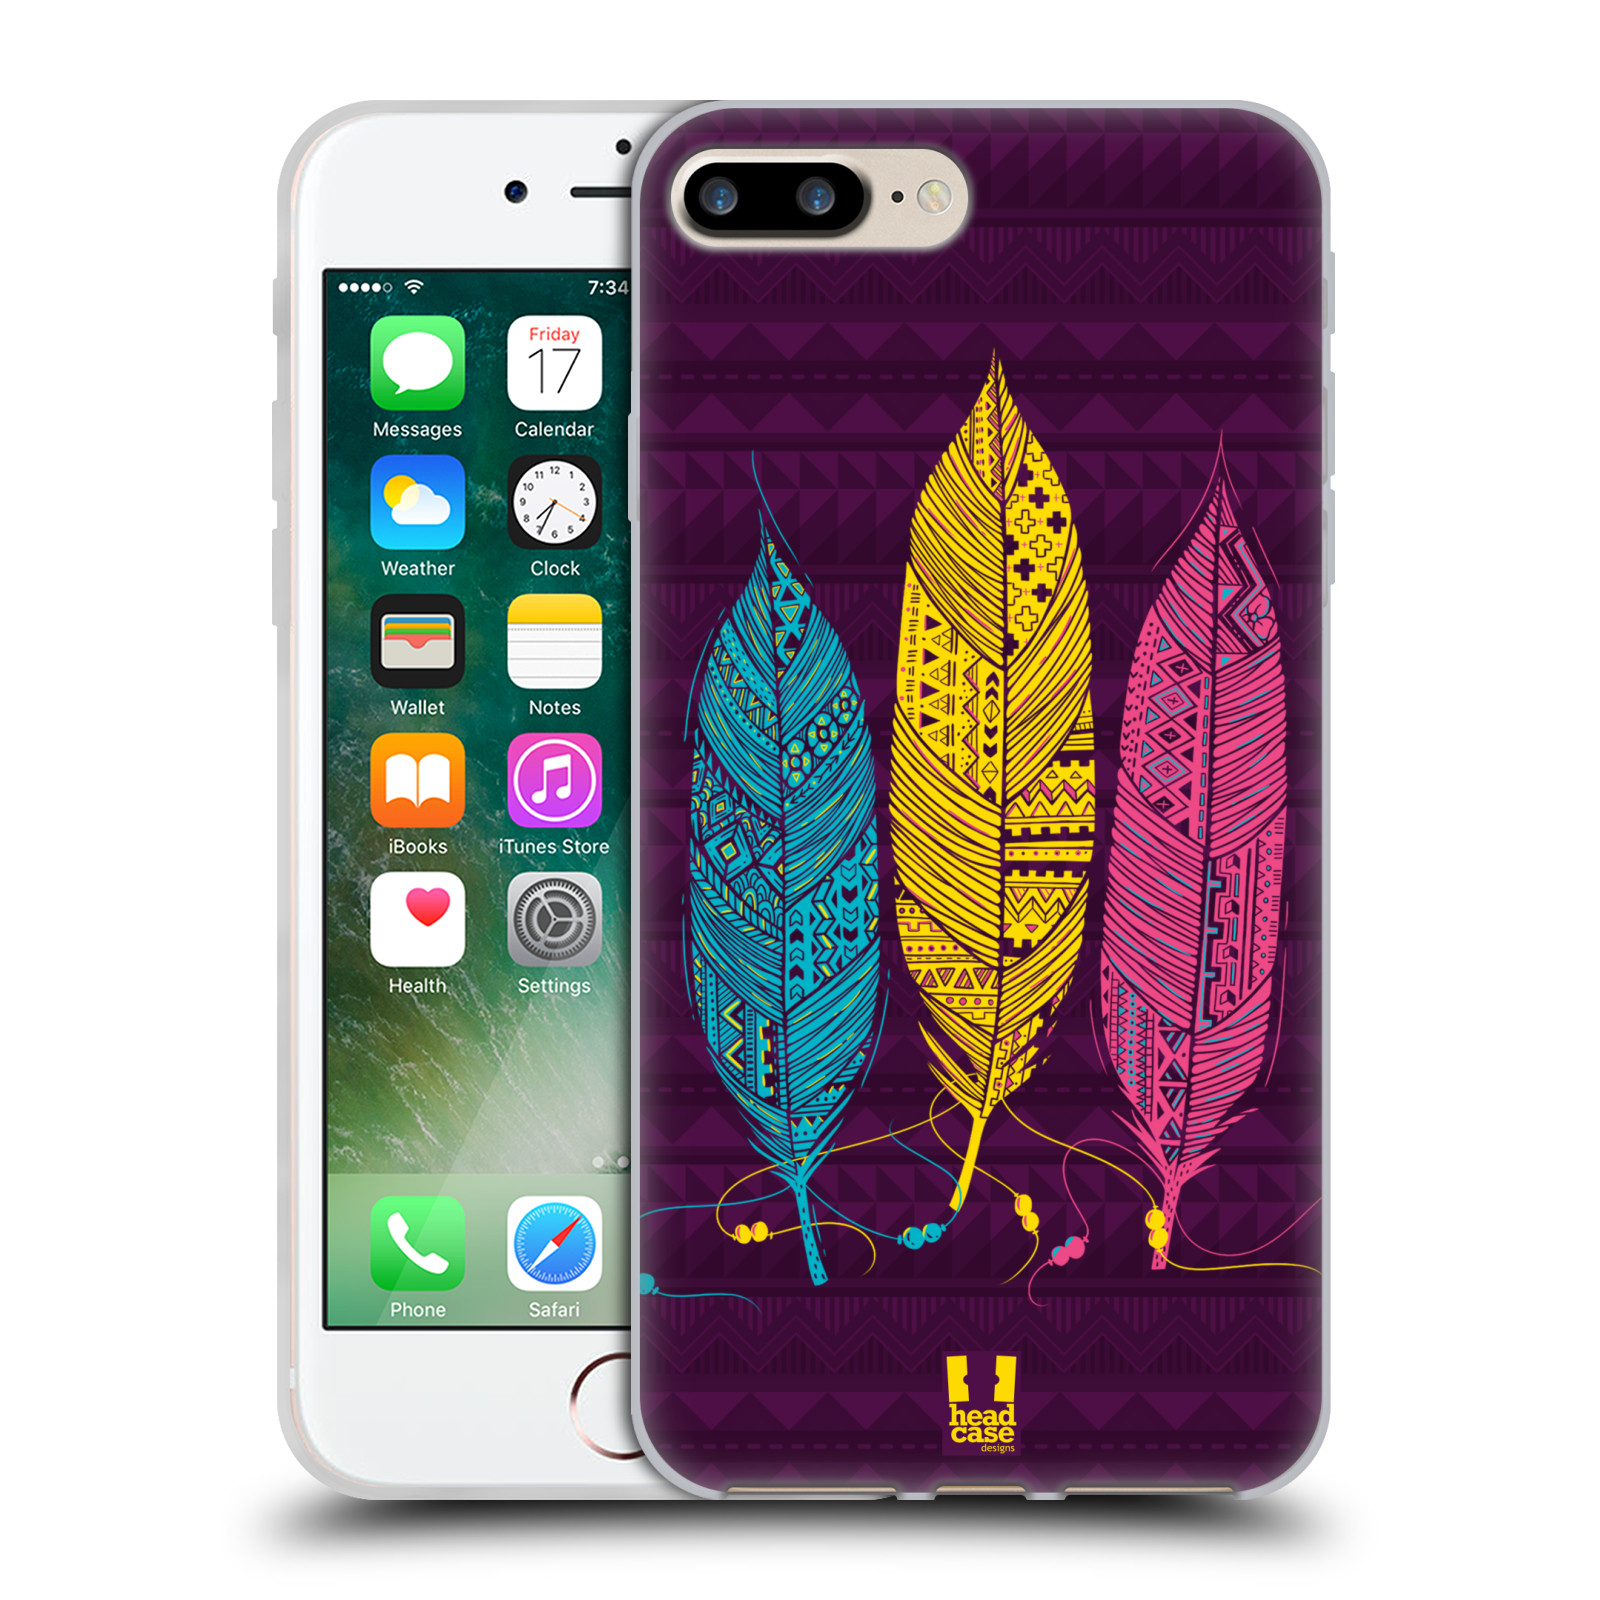 Silikonové pouzdro na mobil Apple iPhone 7 Plus HEAD CASE AZTEC PÍRKA 3 BAREV (Silikonový kryt či obal na mobilní telefon Apple iPhone 7 Plus)